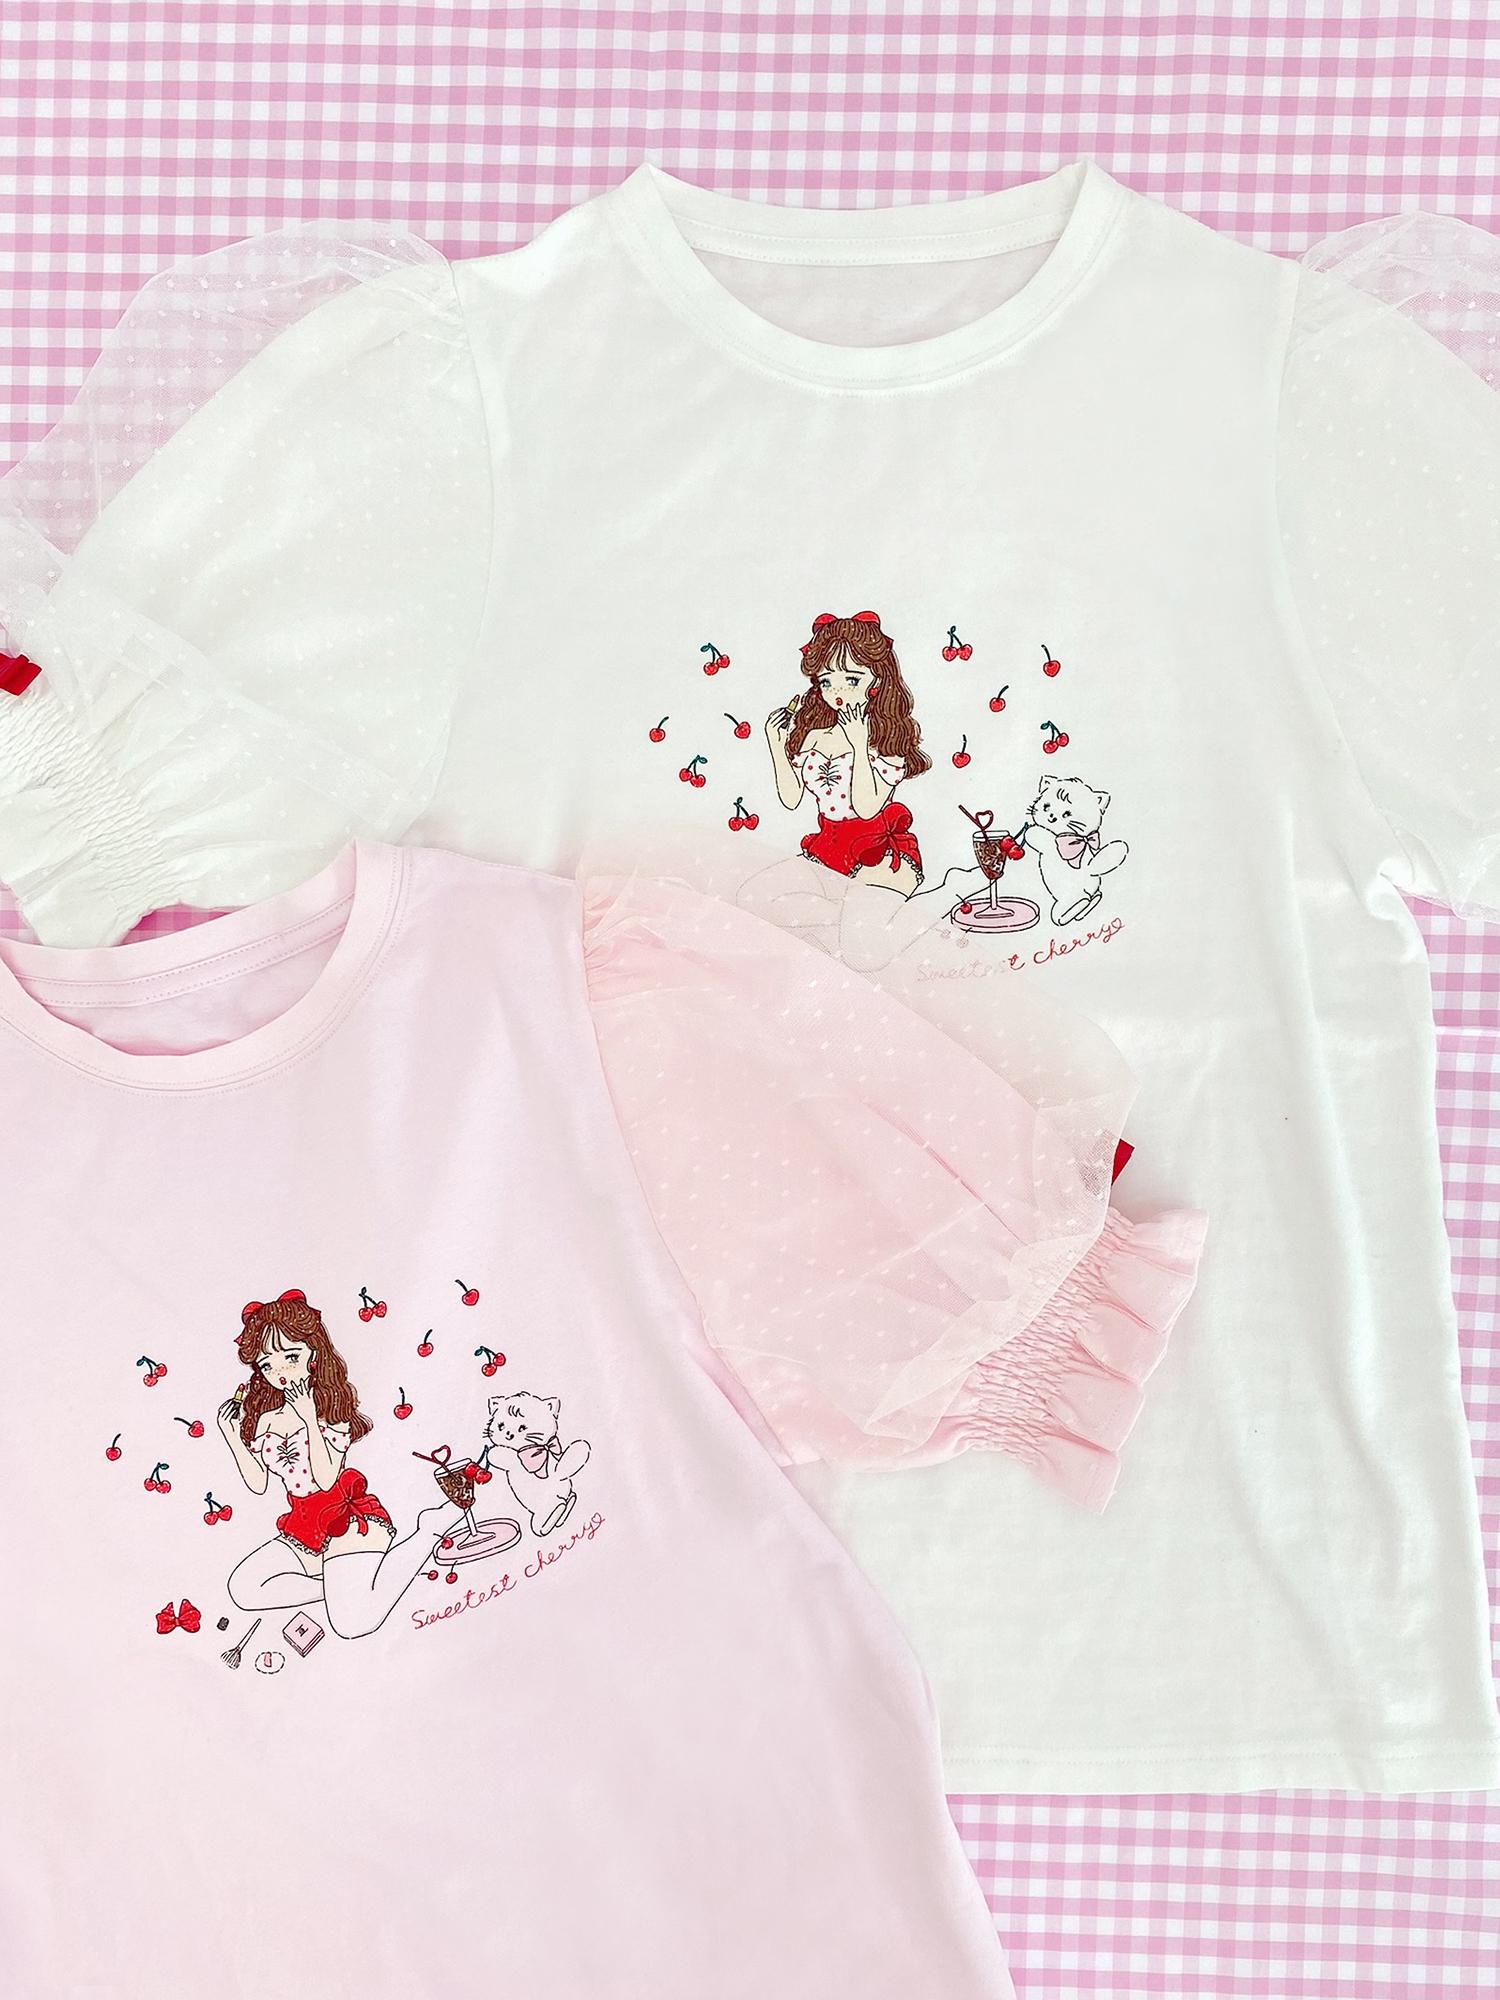 ♡sweetest cherry パフスリーブT / ¥6,490(税込)